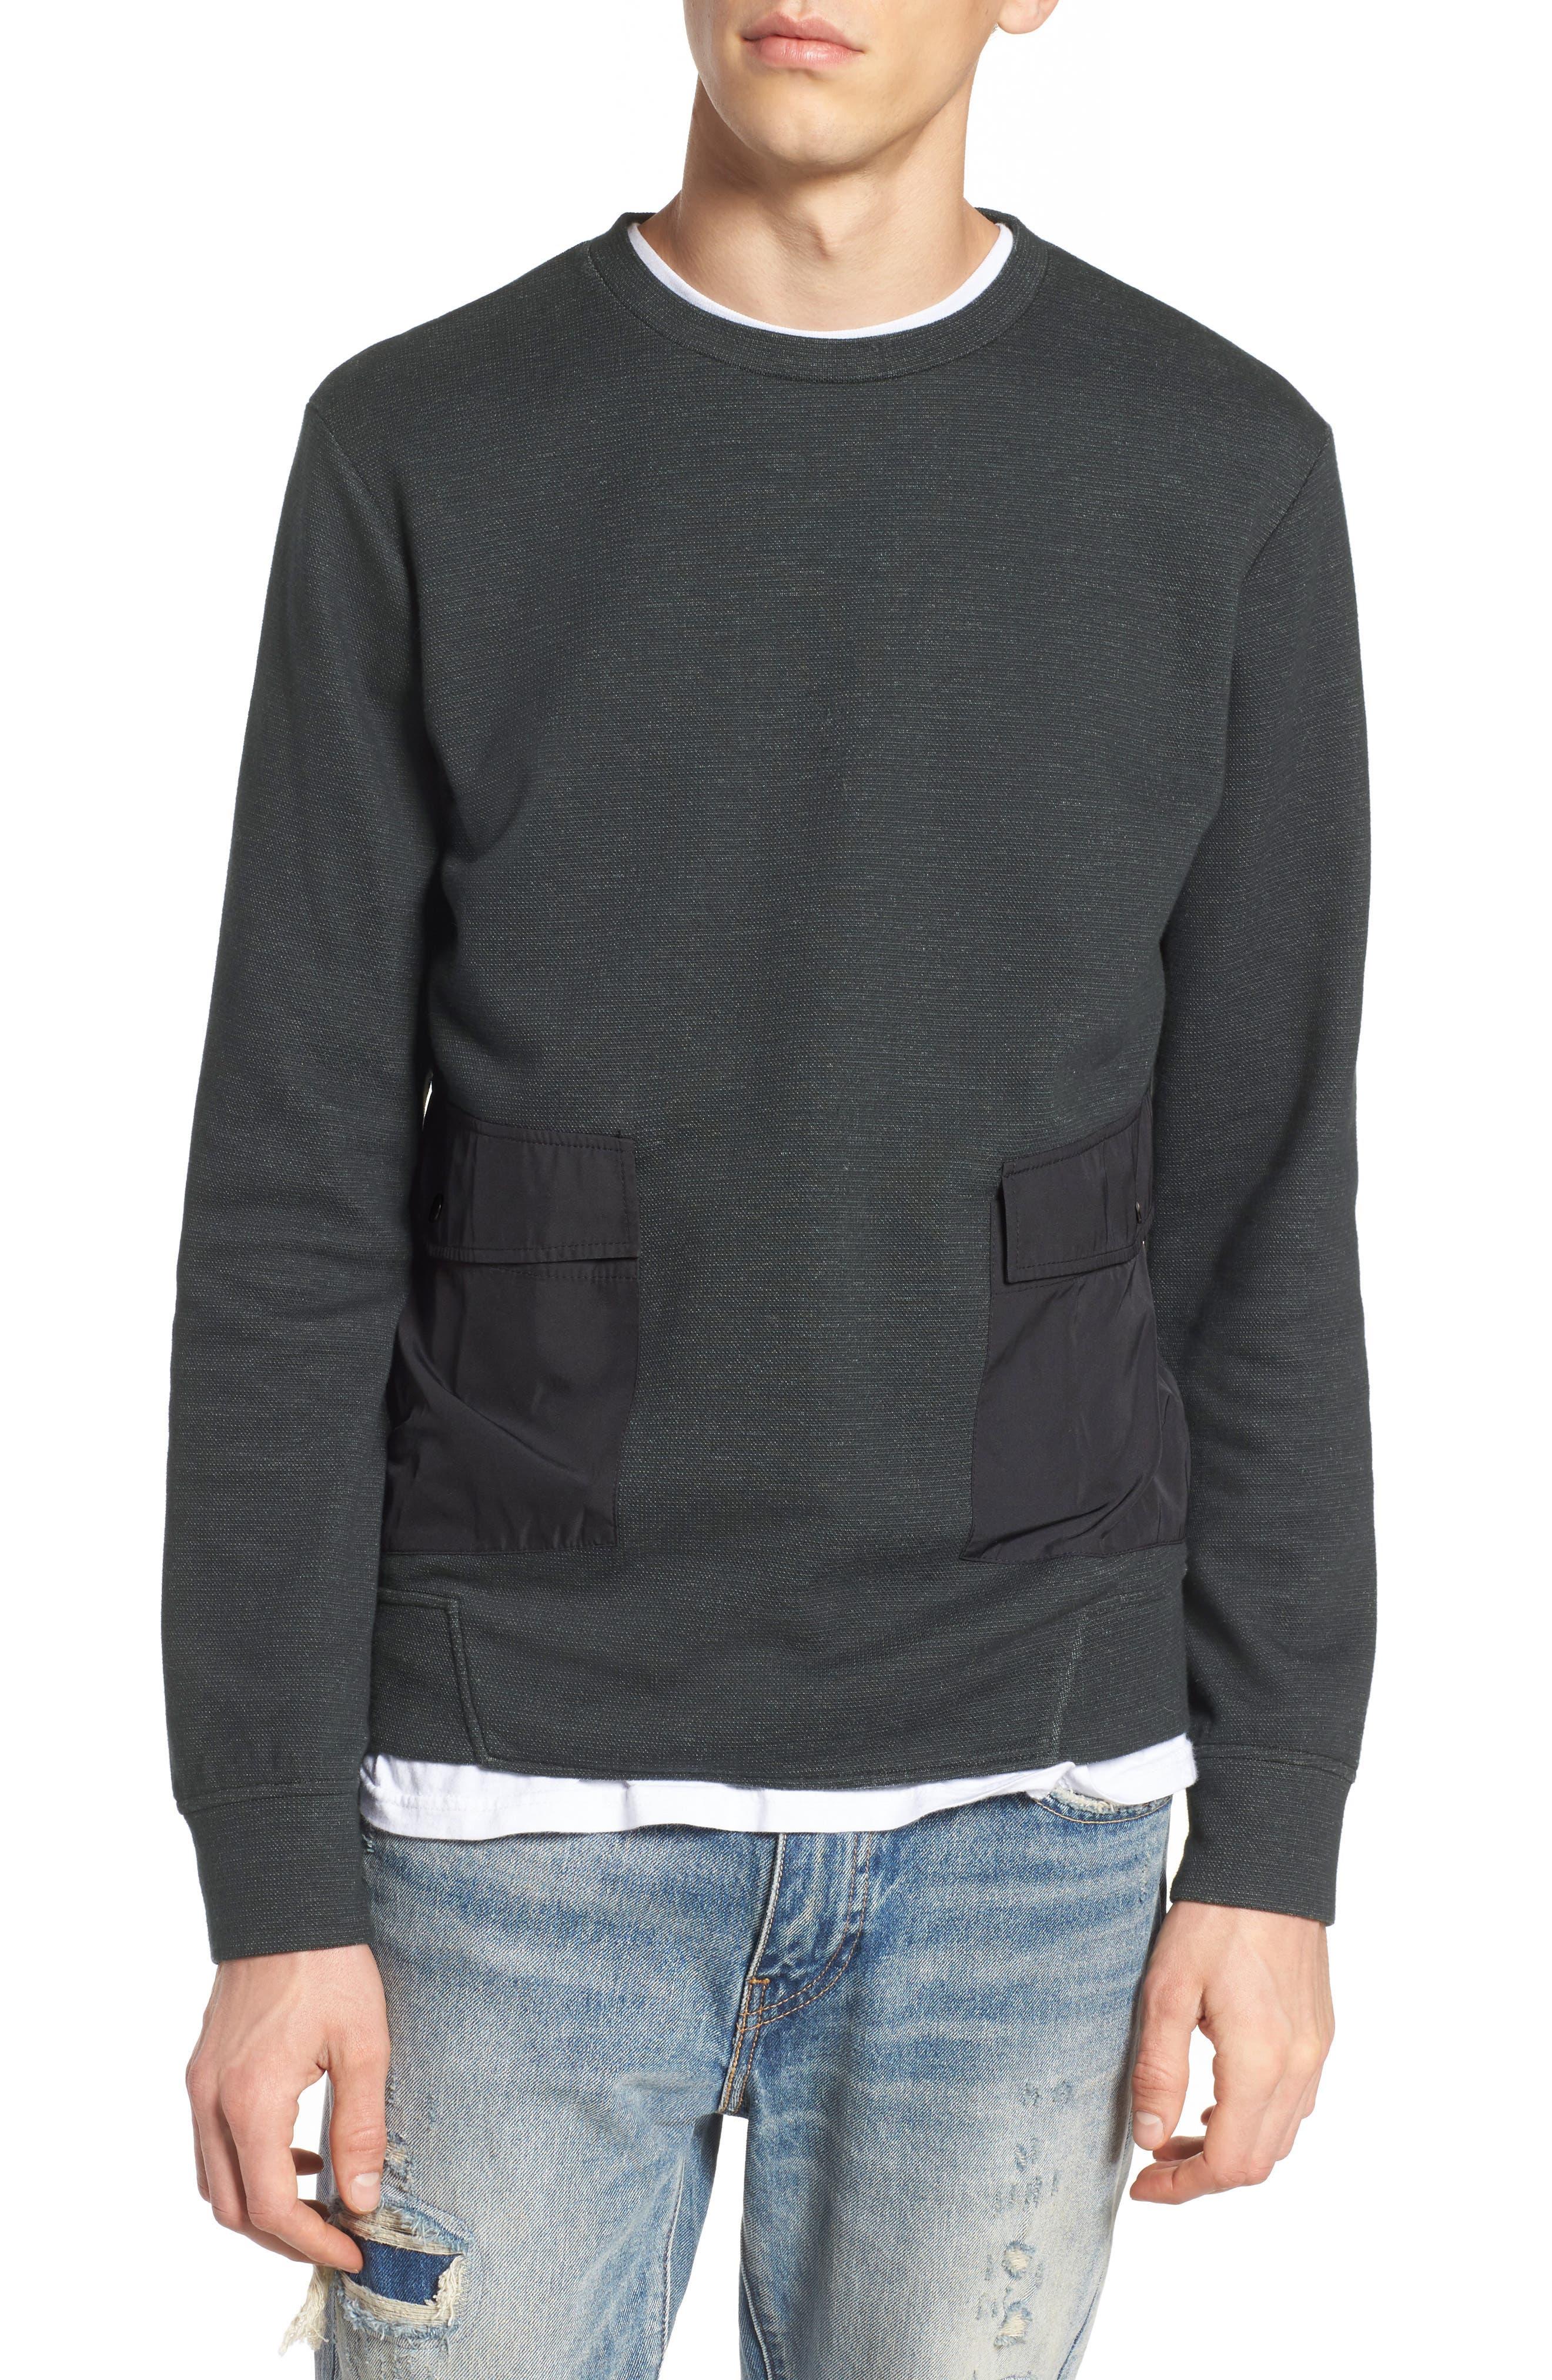 Oracle Sweatshirt,                             Main thumbnail 1, color,                             300